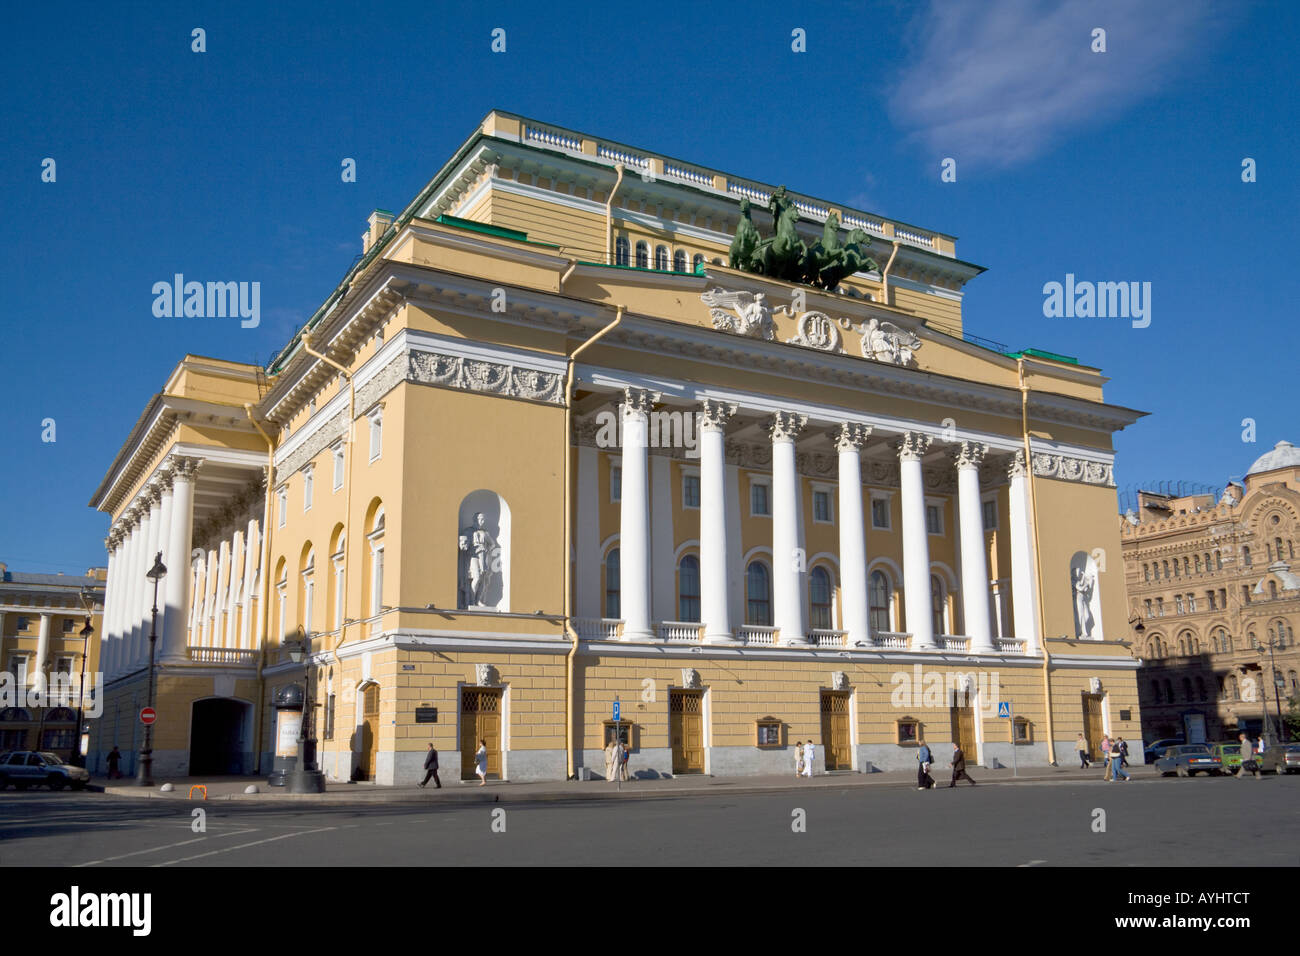 Building of Aleksandrinsky Imperial Ballet Theater established 1756 St Petersburg Russia - Stock Image